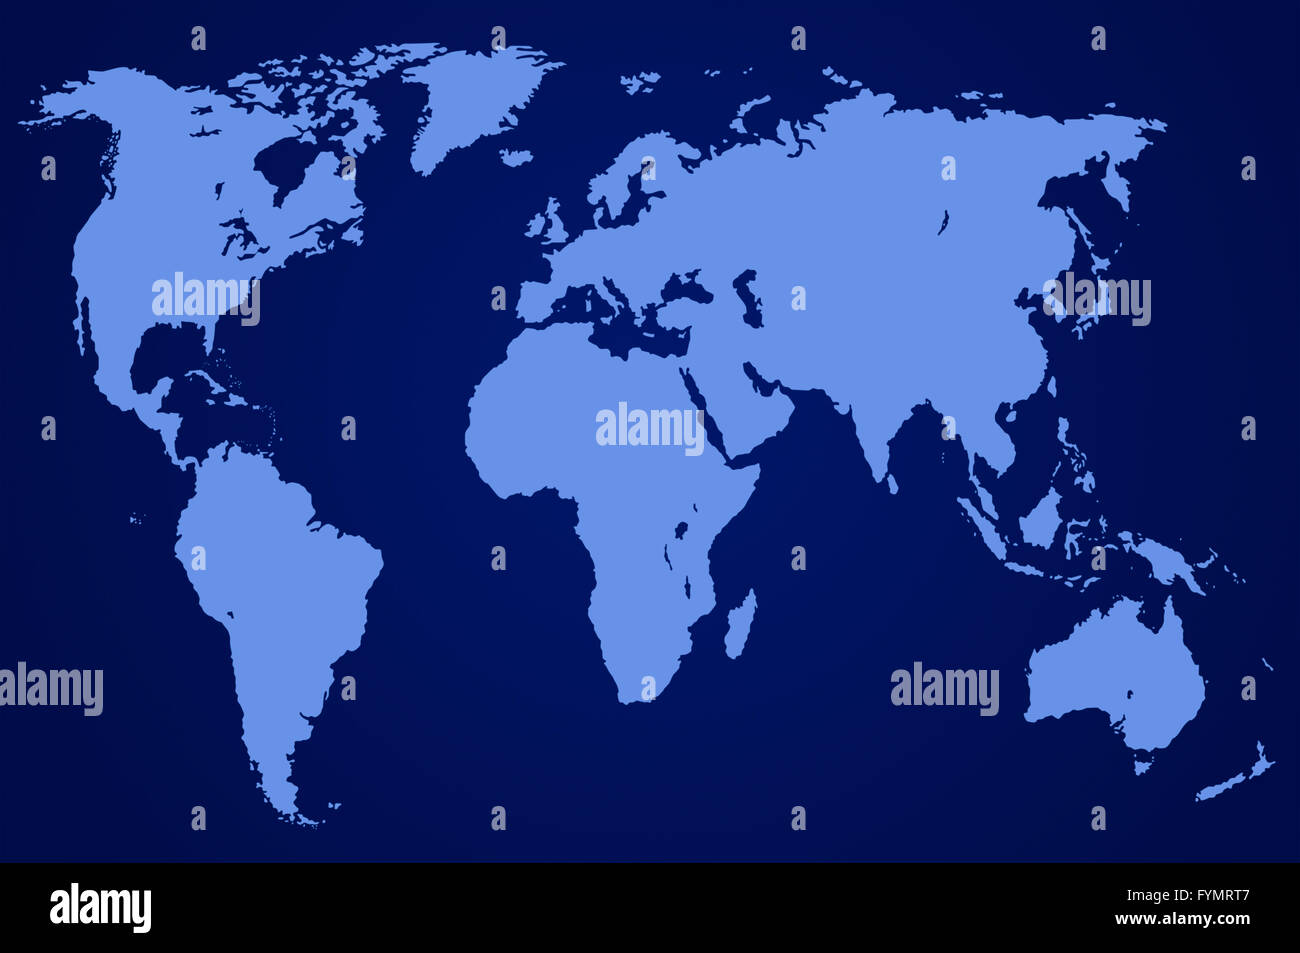 dark blue world map, isolated - Stock Image